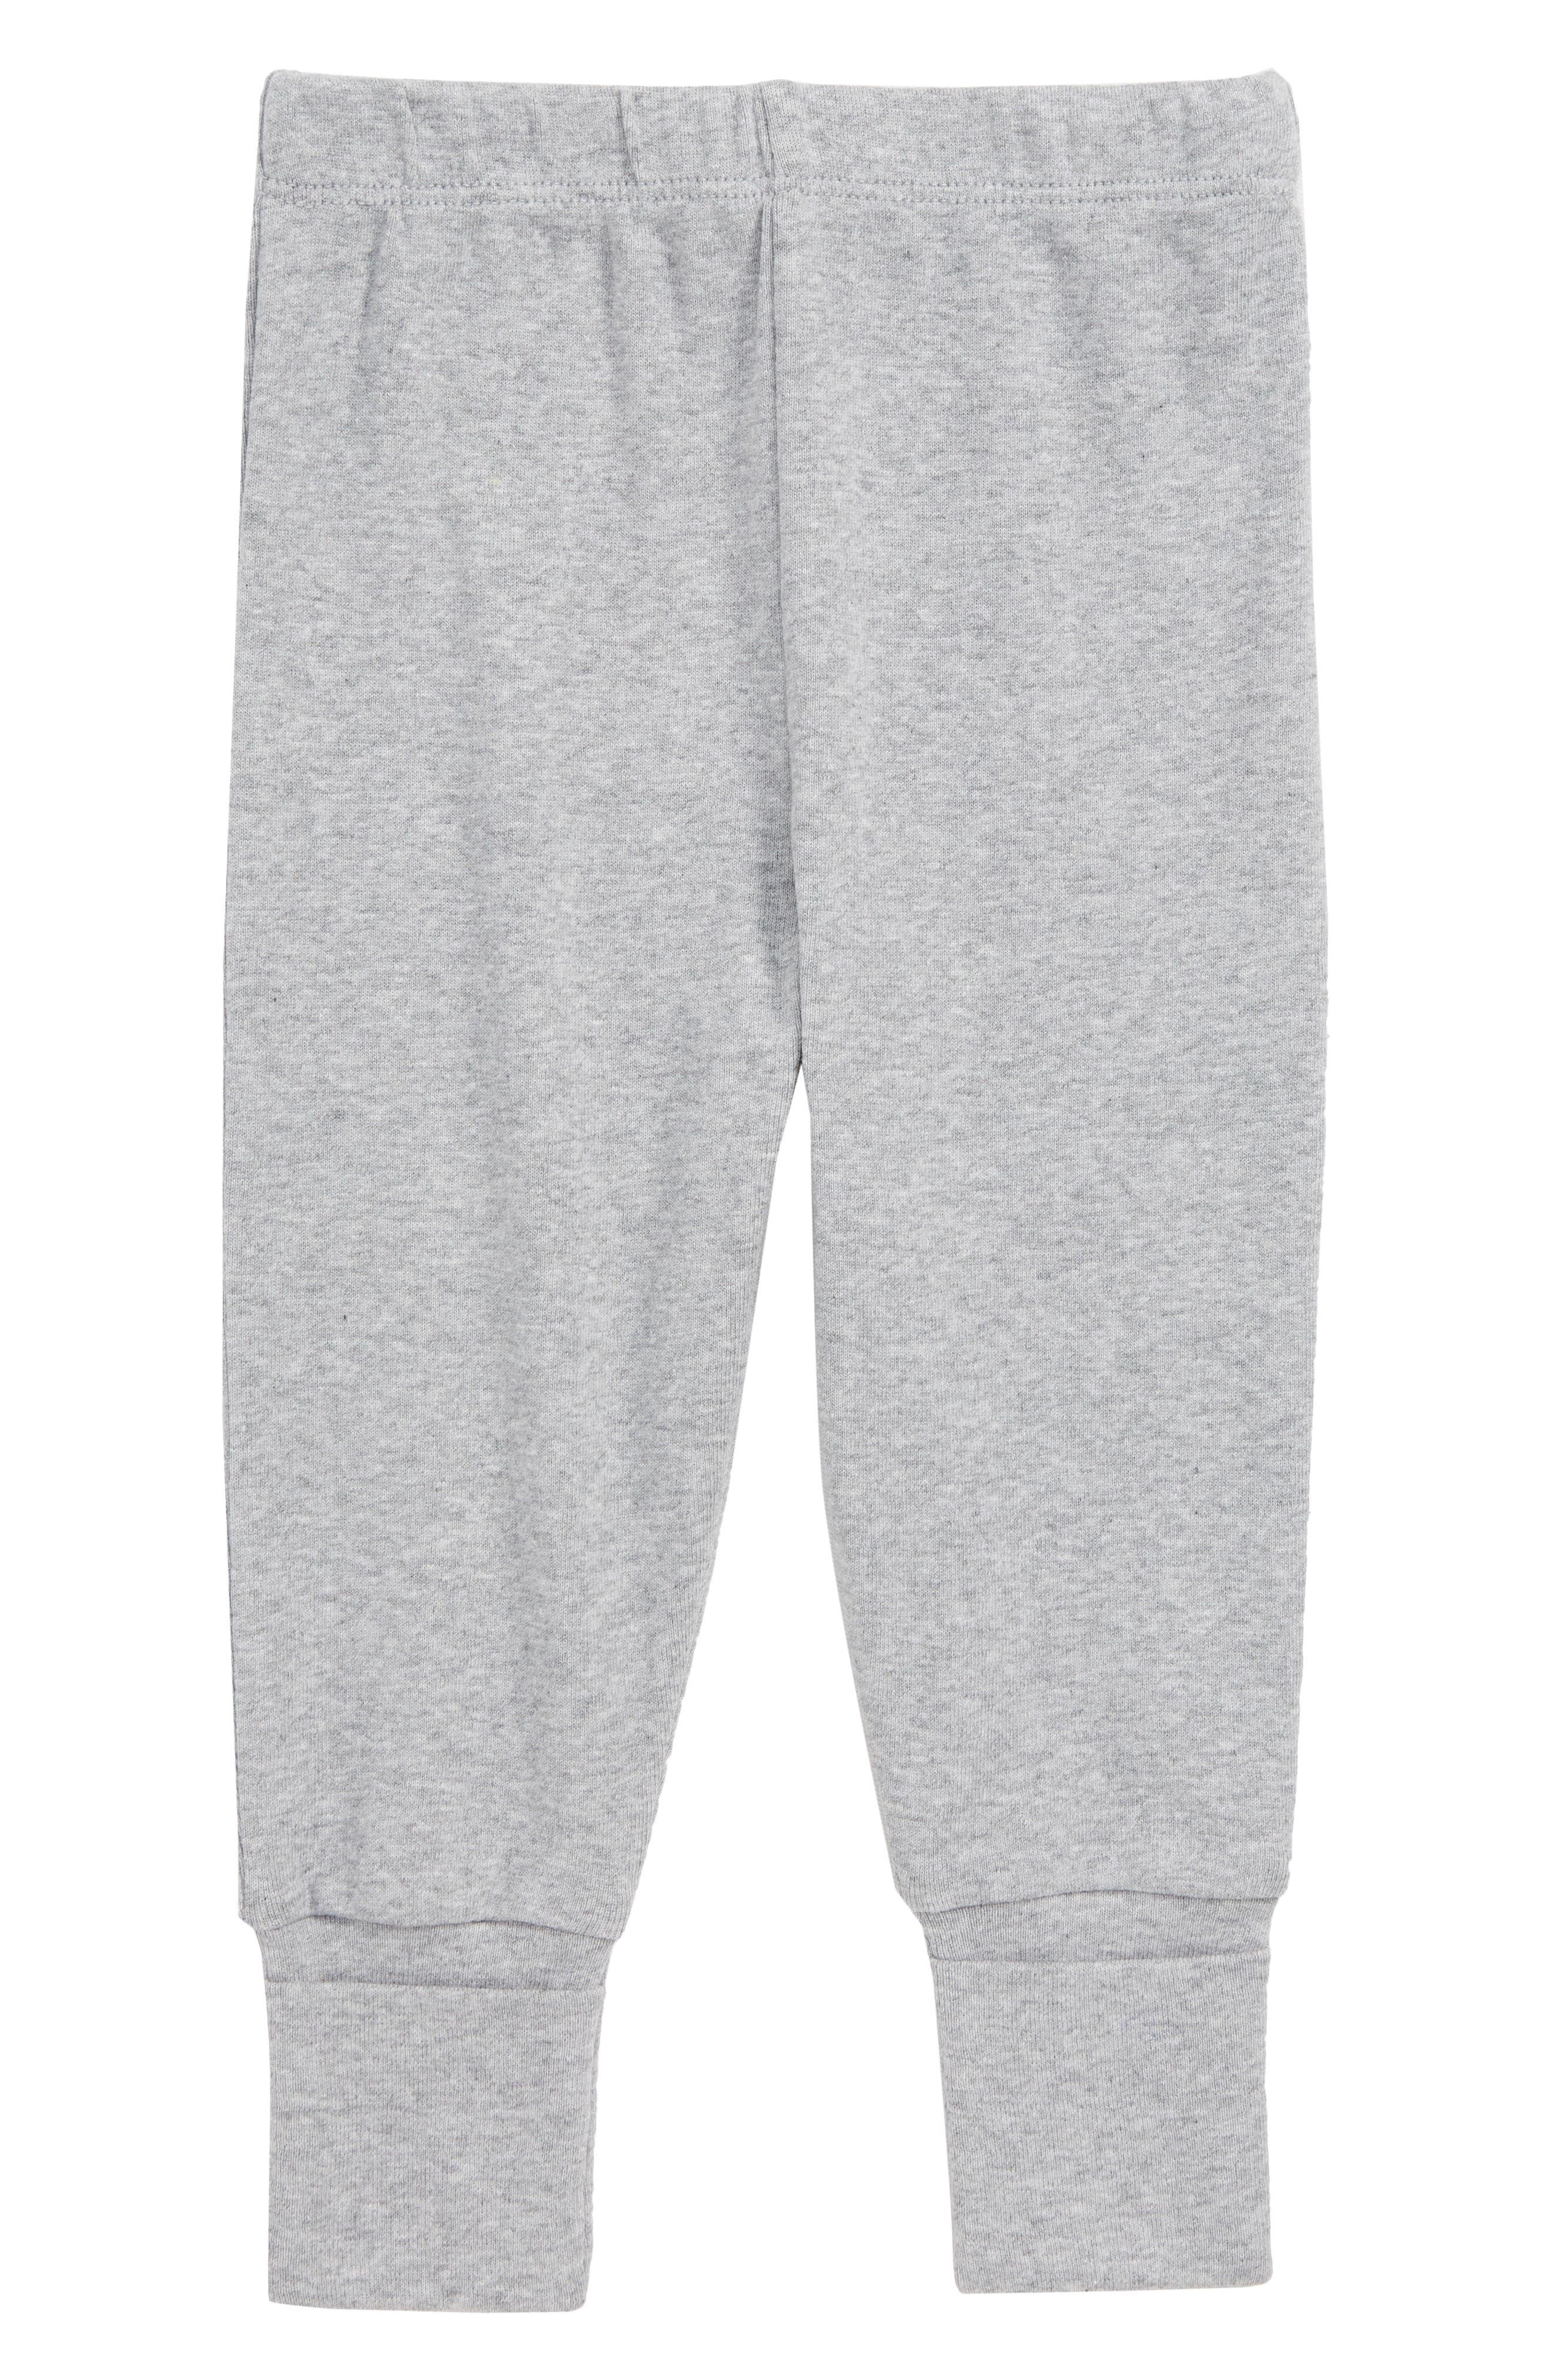 Hello Baby Organic Cotton Sweatpants,                             Main thumbnail 1, color,                             020